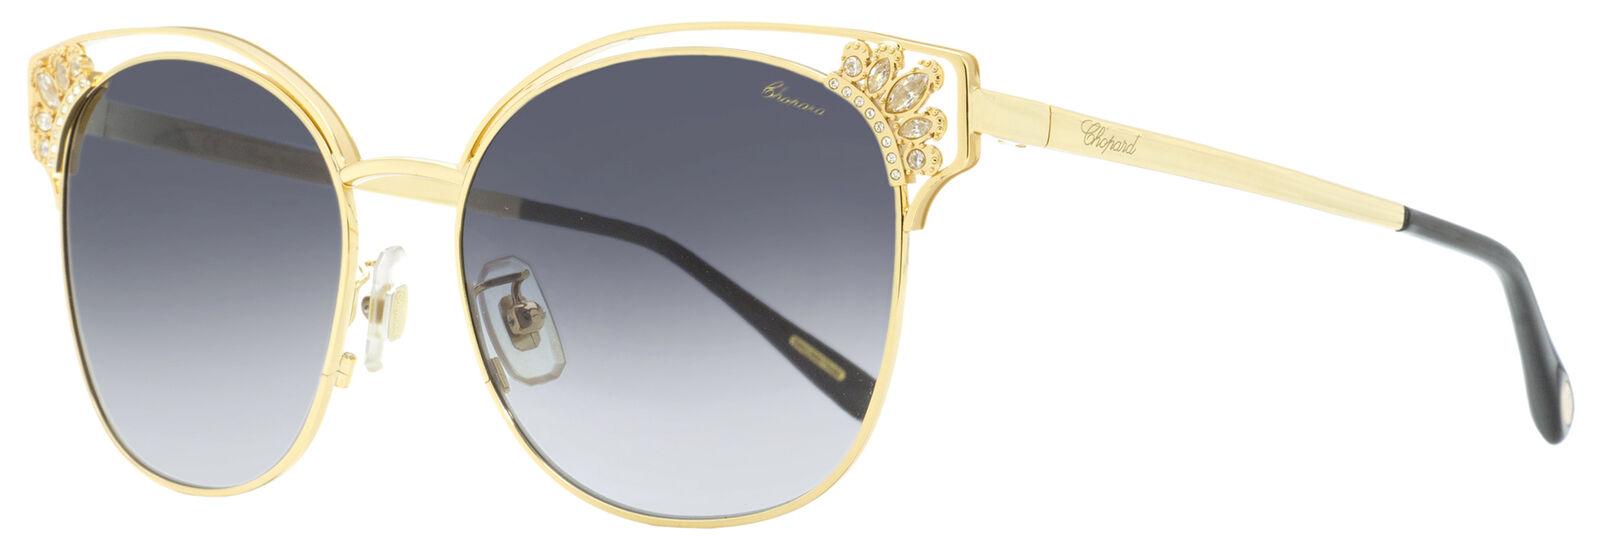 Chopard Square Sunglasses SCHC24S 349F Gold/Black 57mm C24